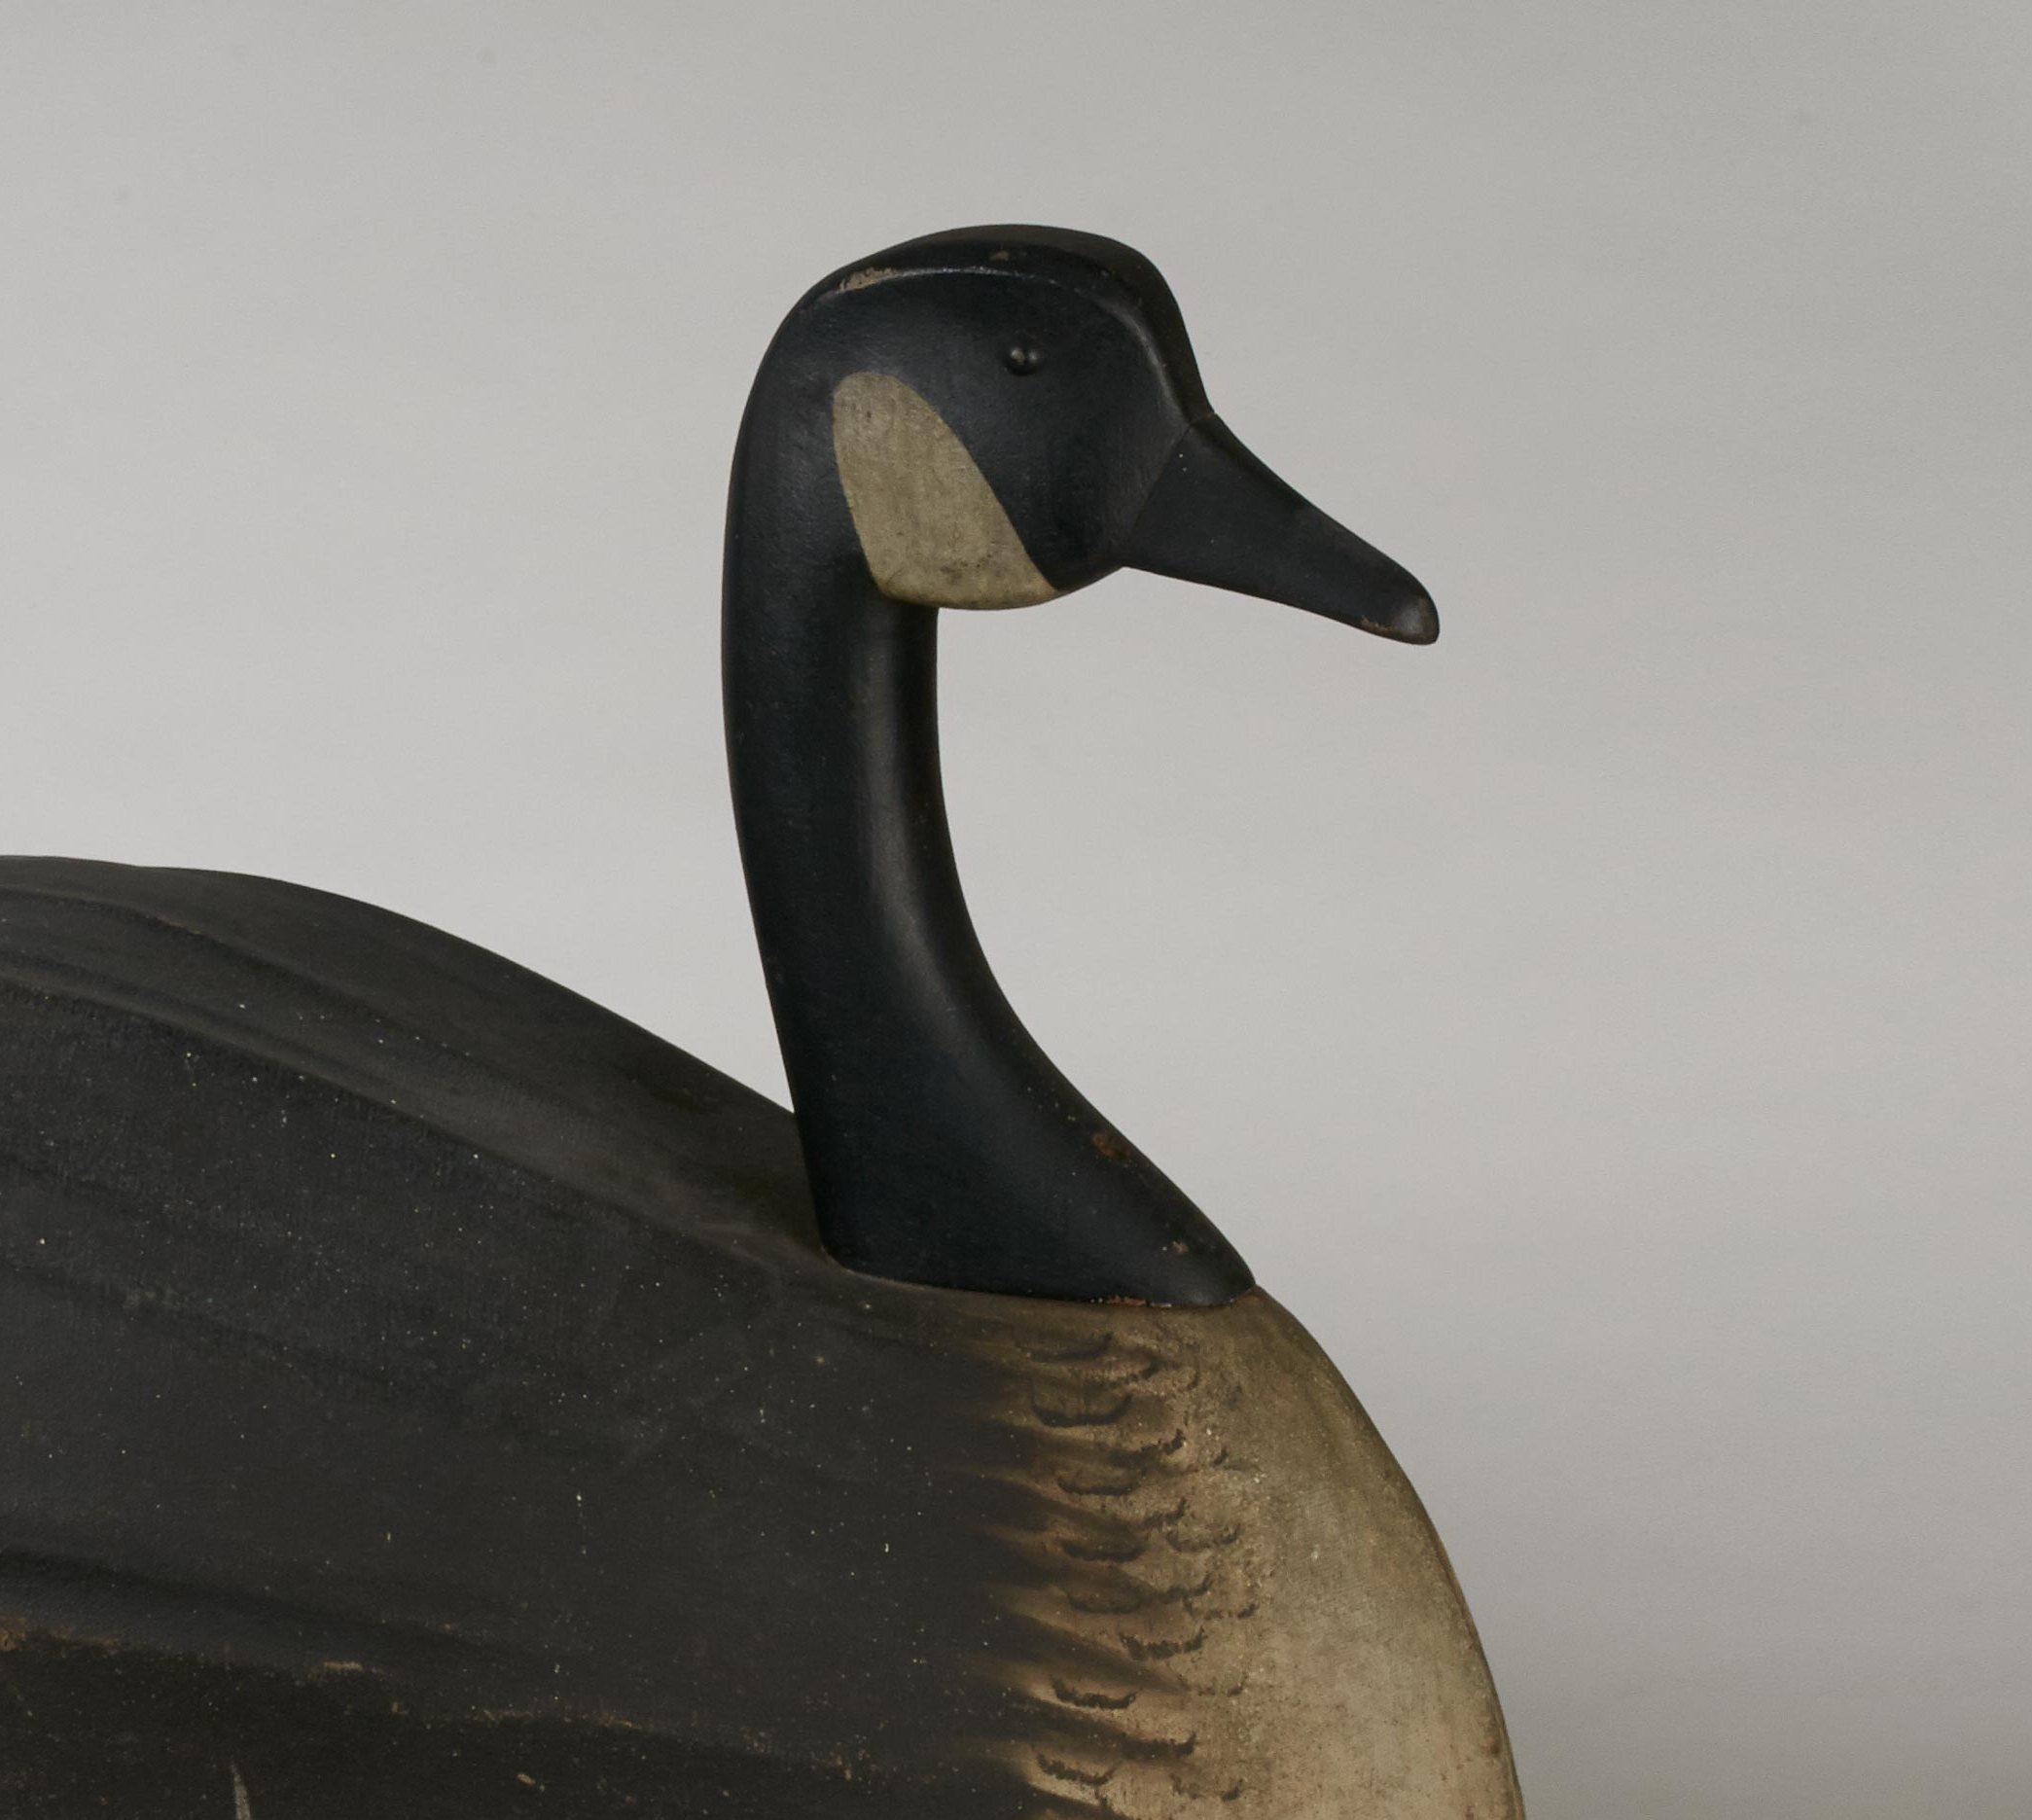 antique canada goose decoy rel=